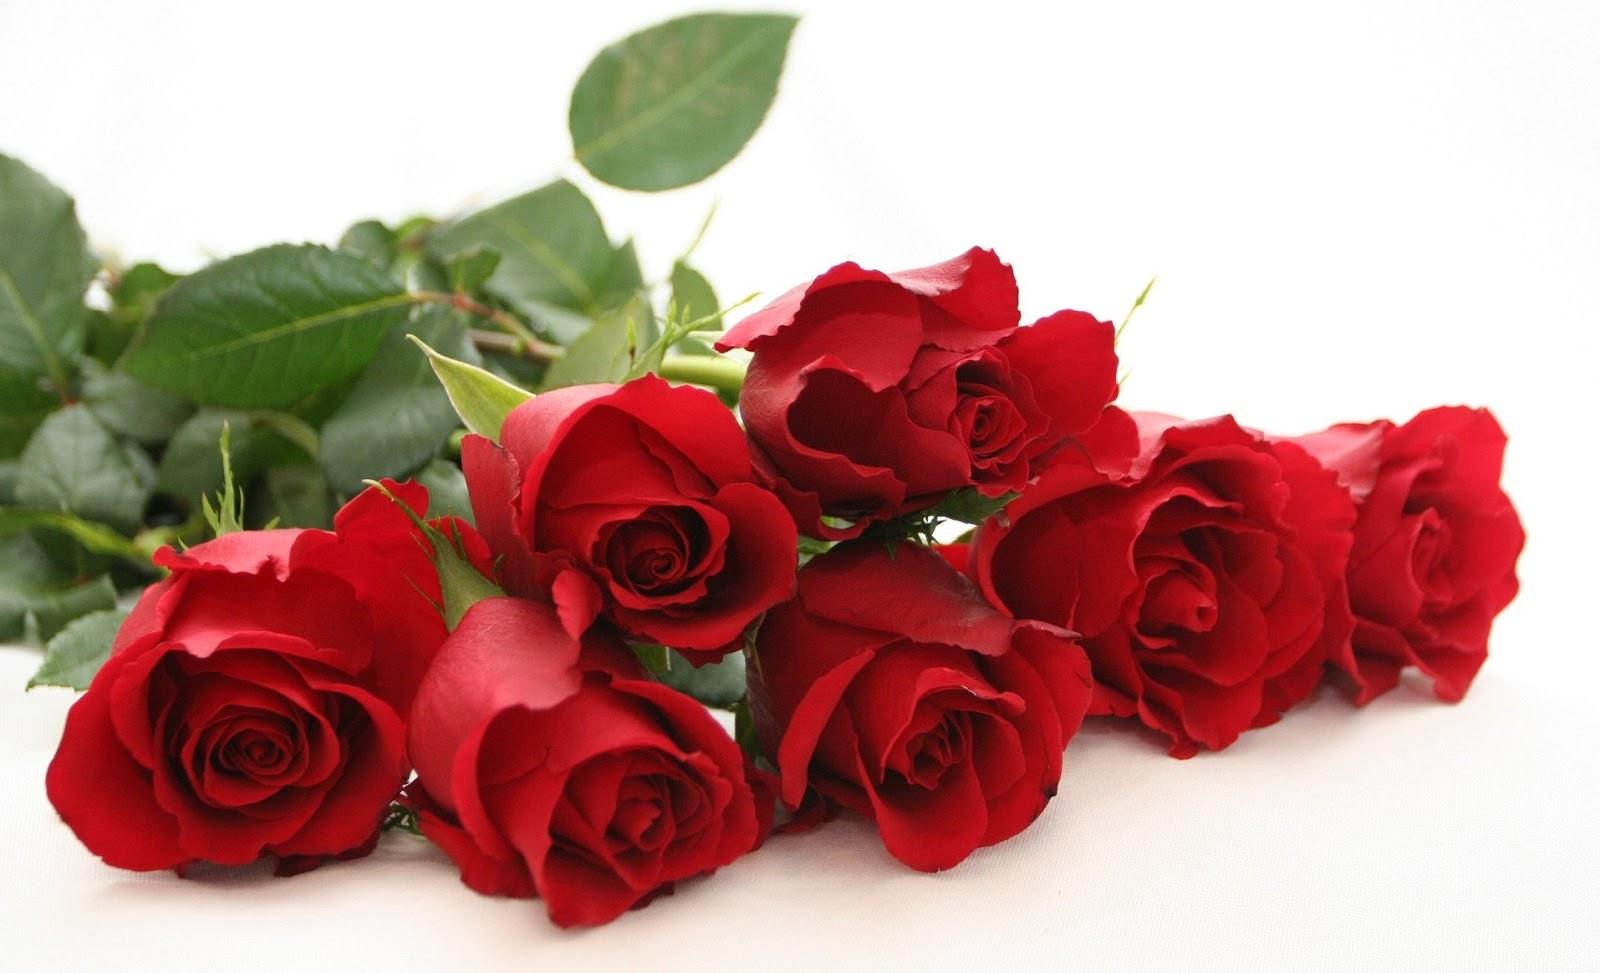 http://4.bp.blogspot.com/-7RTZXz24k48/URI3aUQH5yI/AAAAAAAAA0Q/njnNnoYGM6g/s1600/happy-rose-day-rose-images-2013.jpg